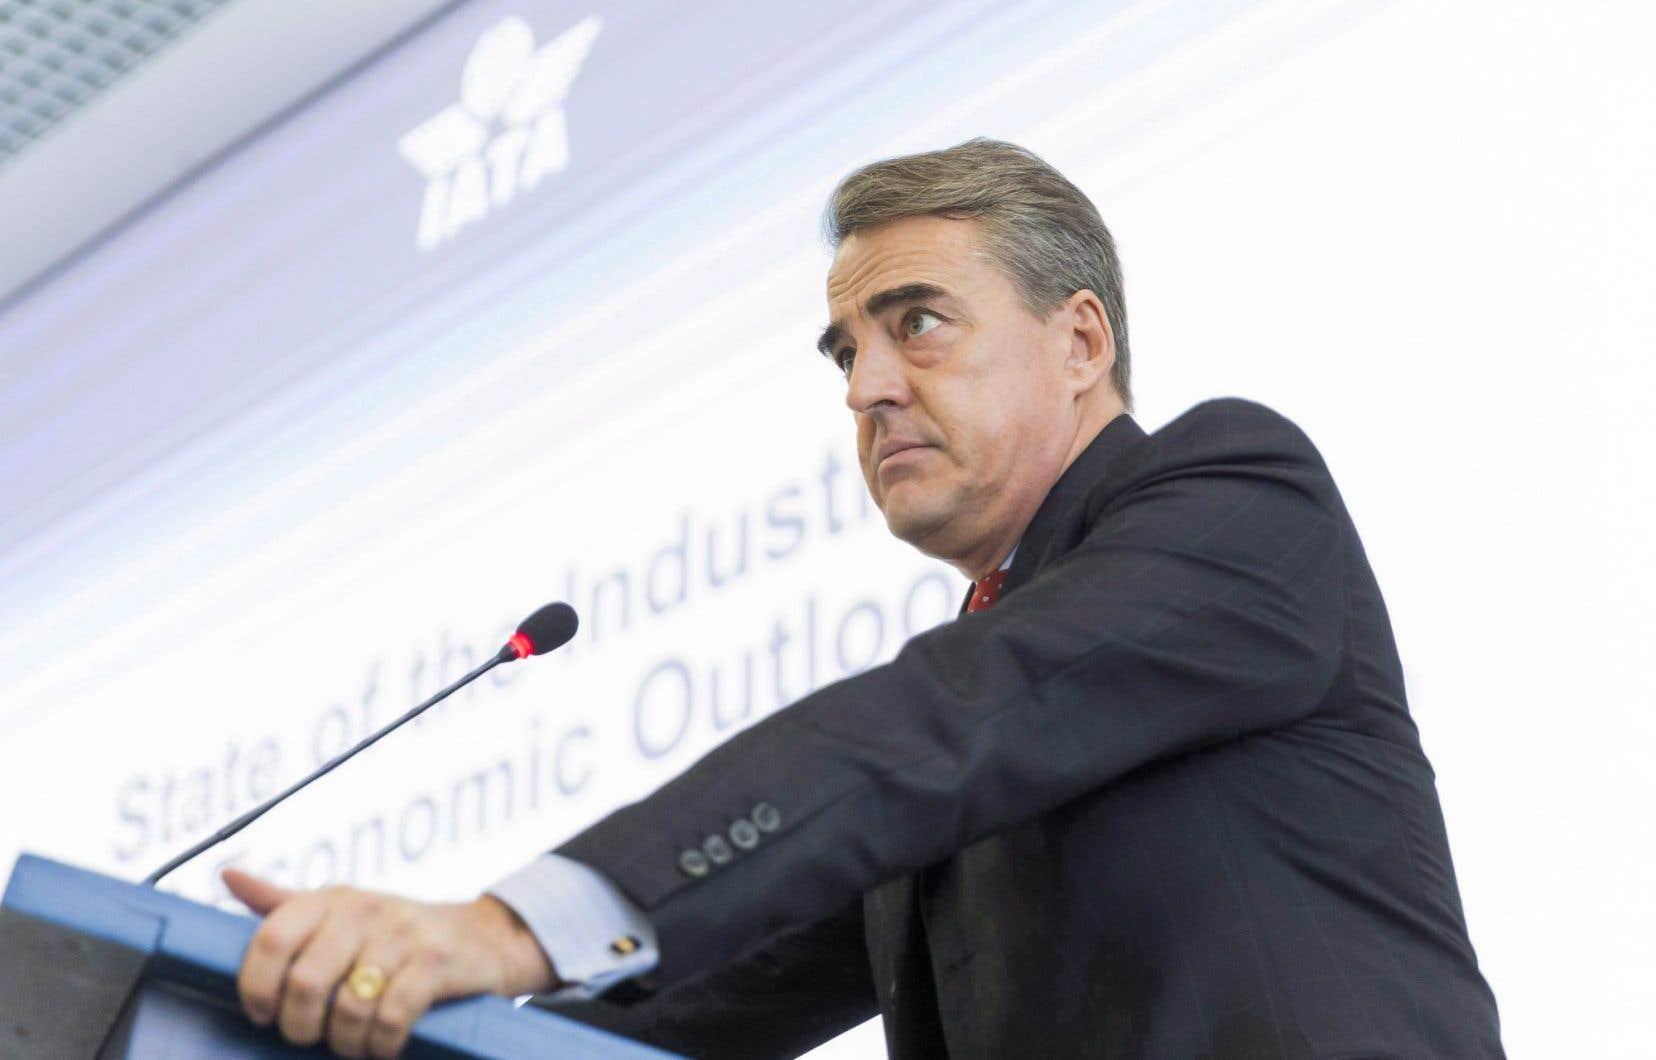 Alexandre de Juniac, directeur general de l'Association internationale du transport aérien (IATA)